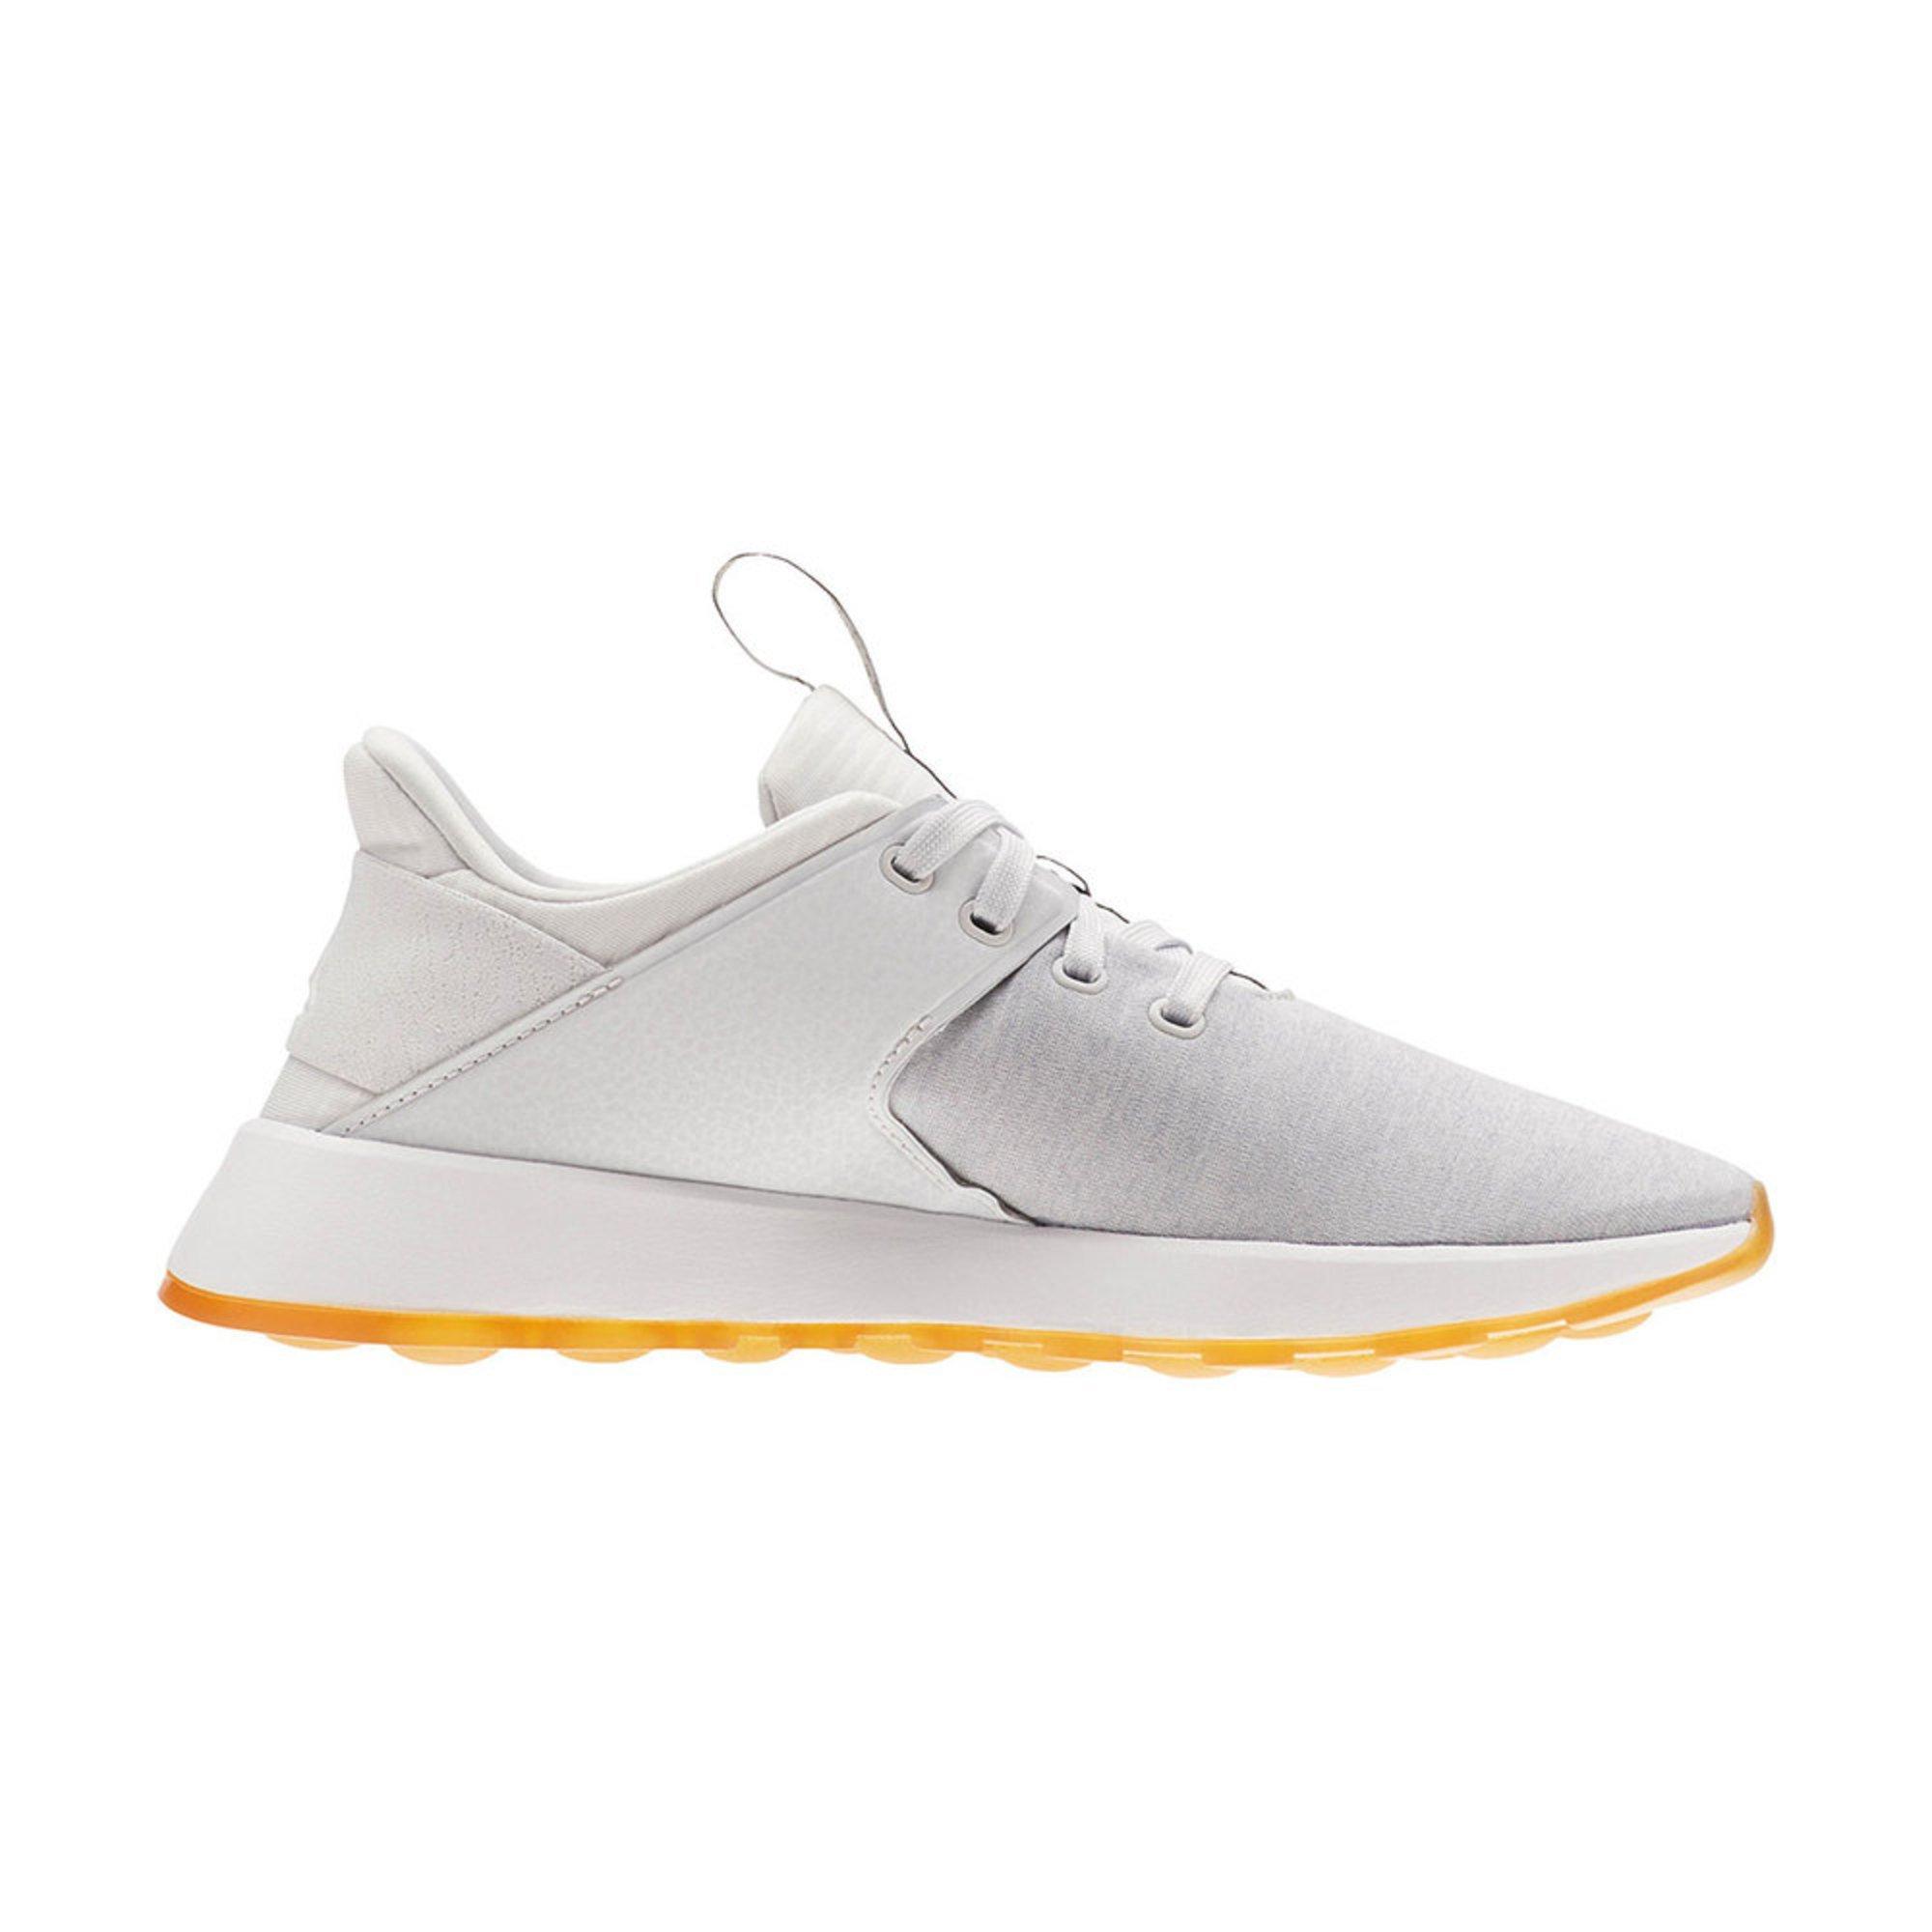 1cd7322e2c2 Reebok. Reebok Women s Ever Road DMX Walking Shoe